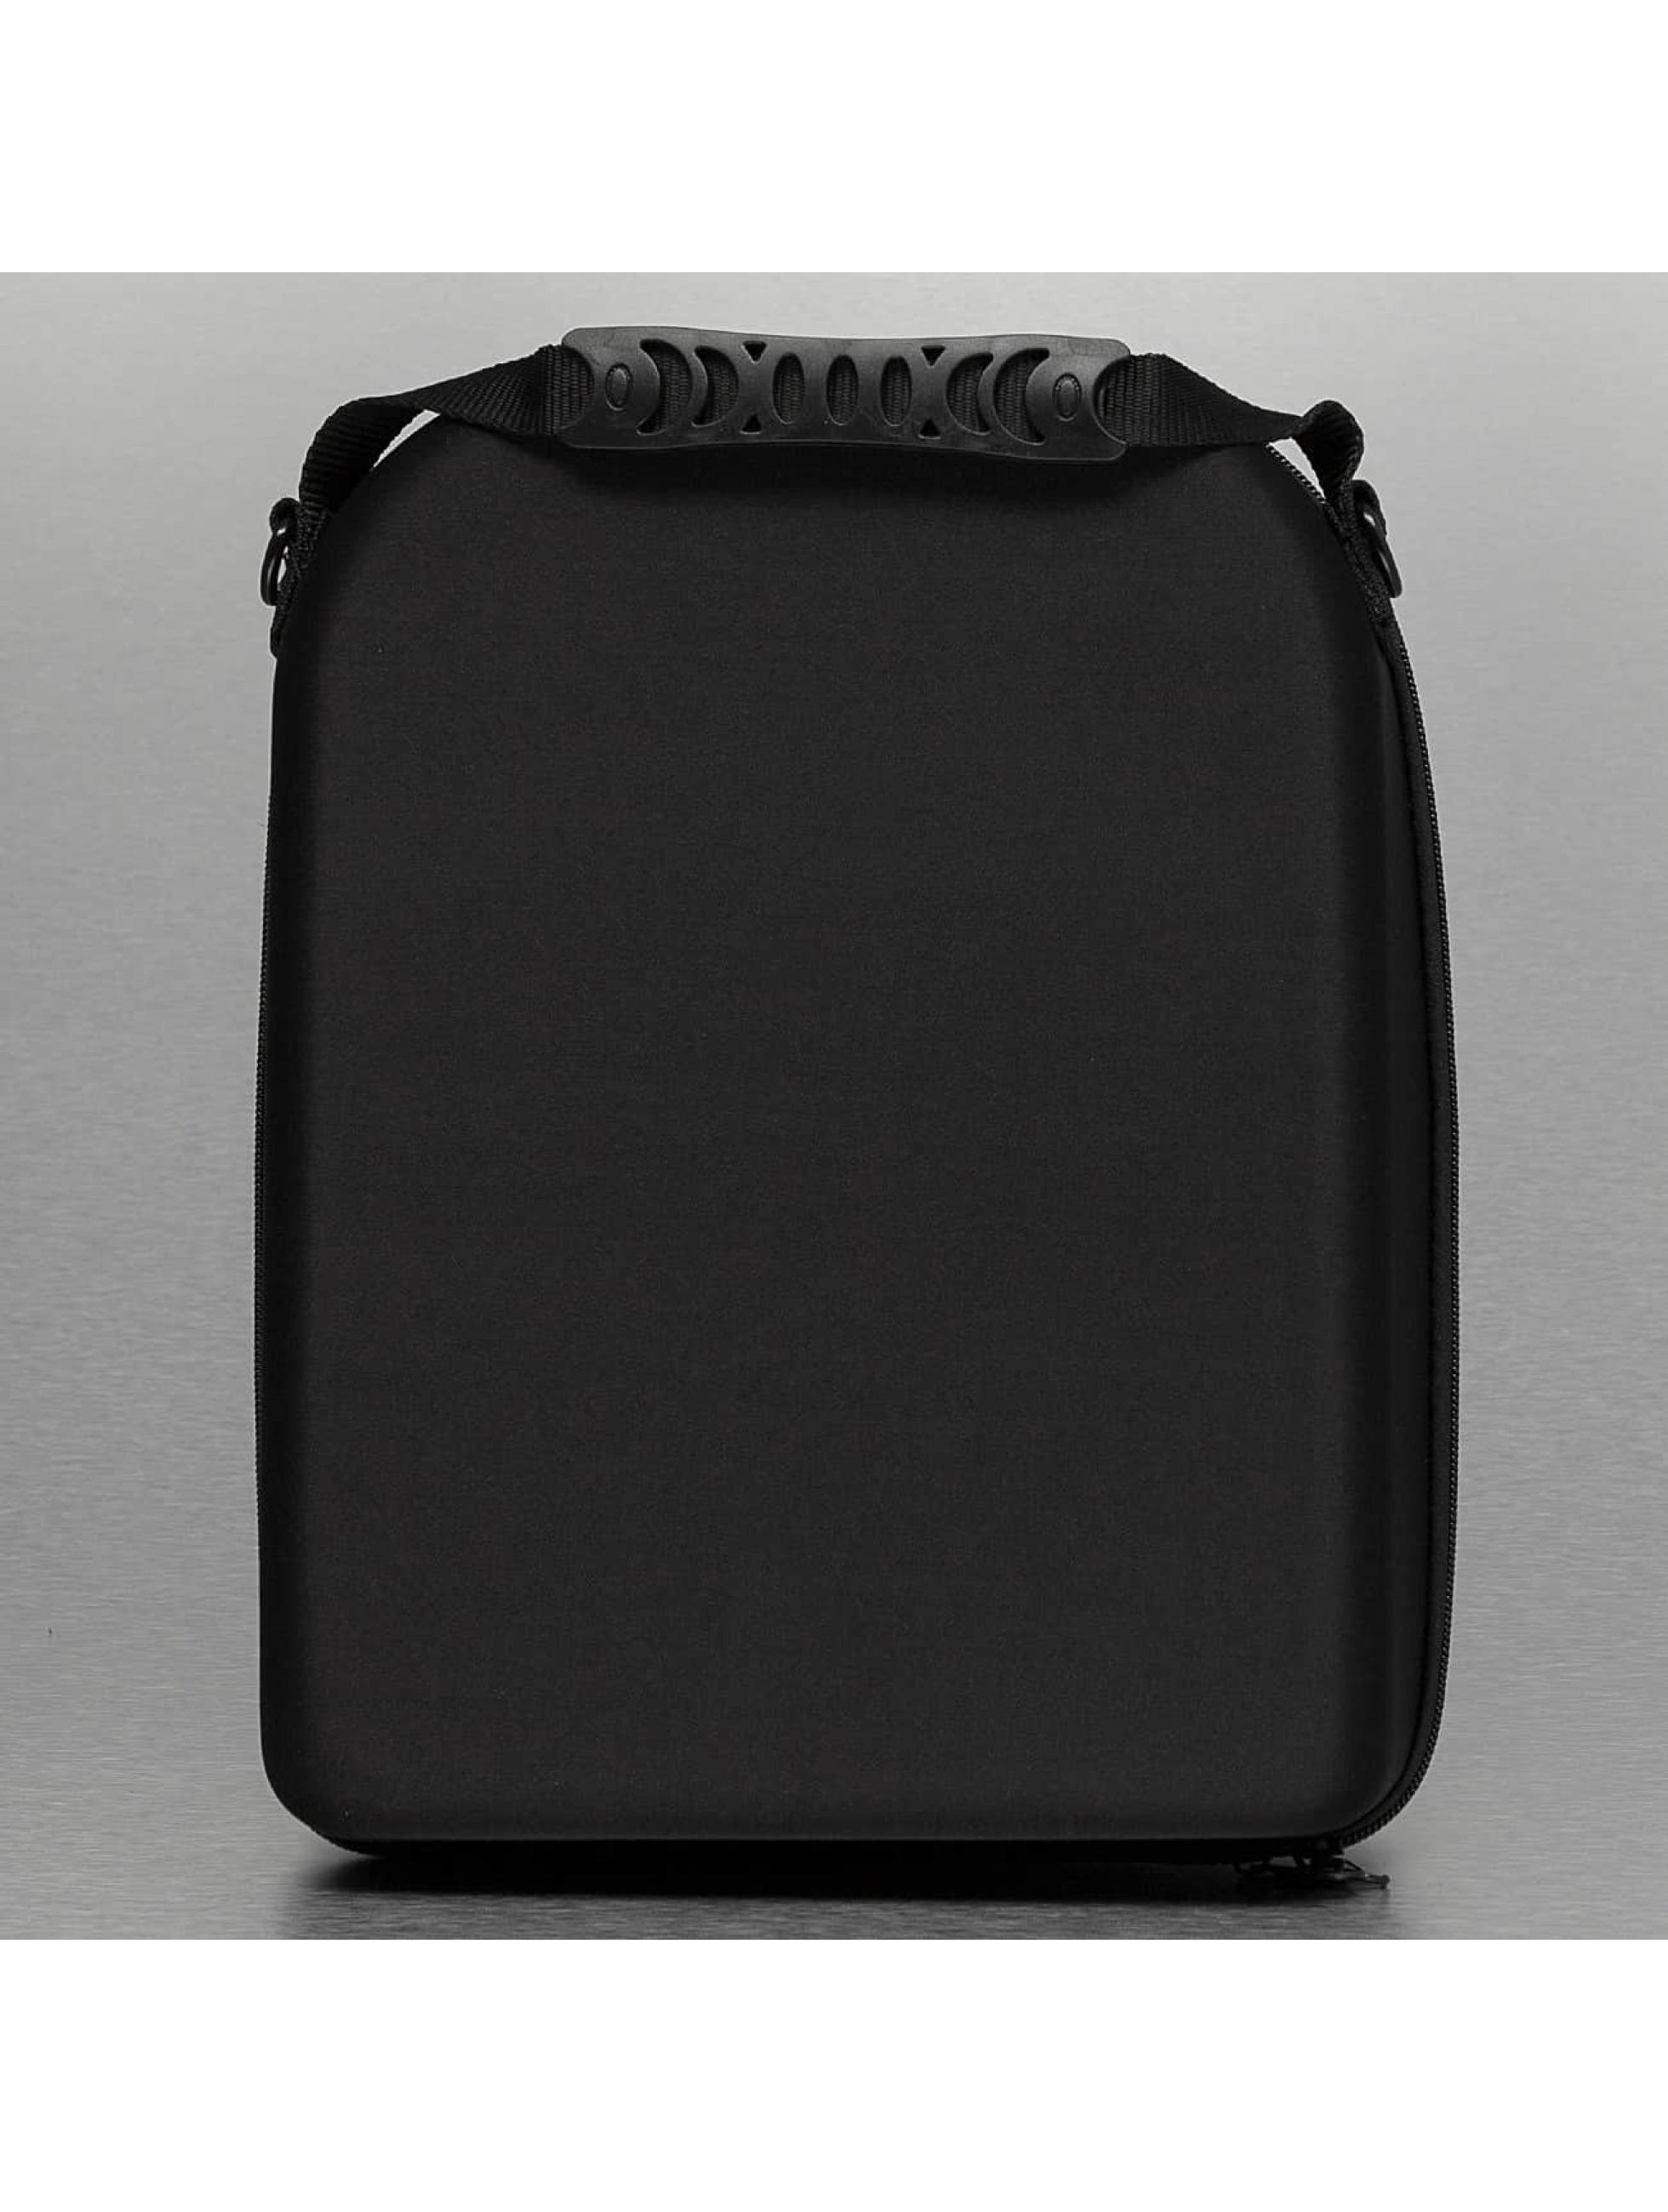 Cap Crony Muut 6K Carrier Travel Box musta